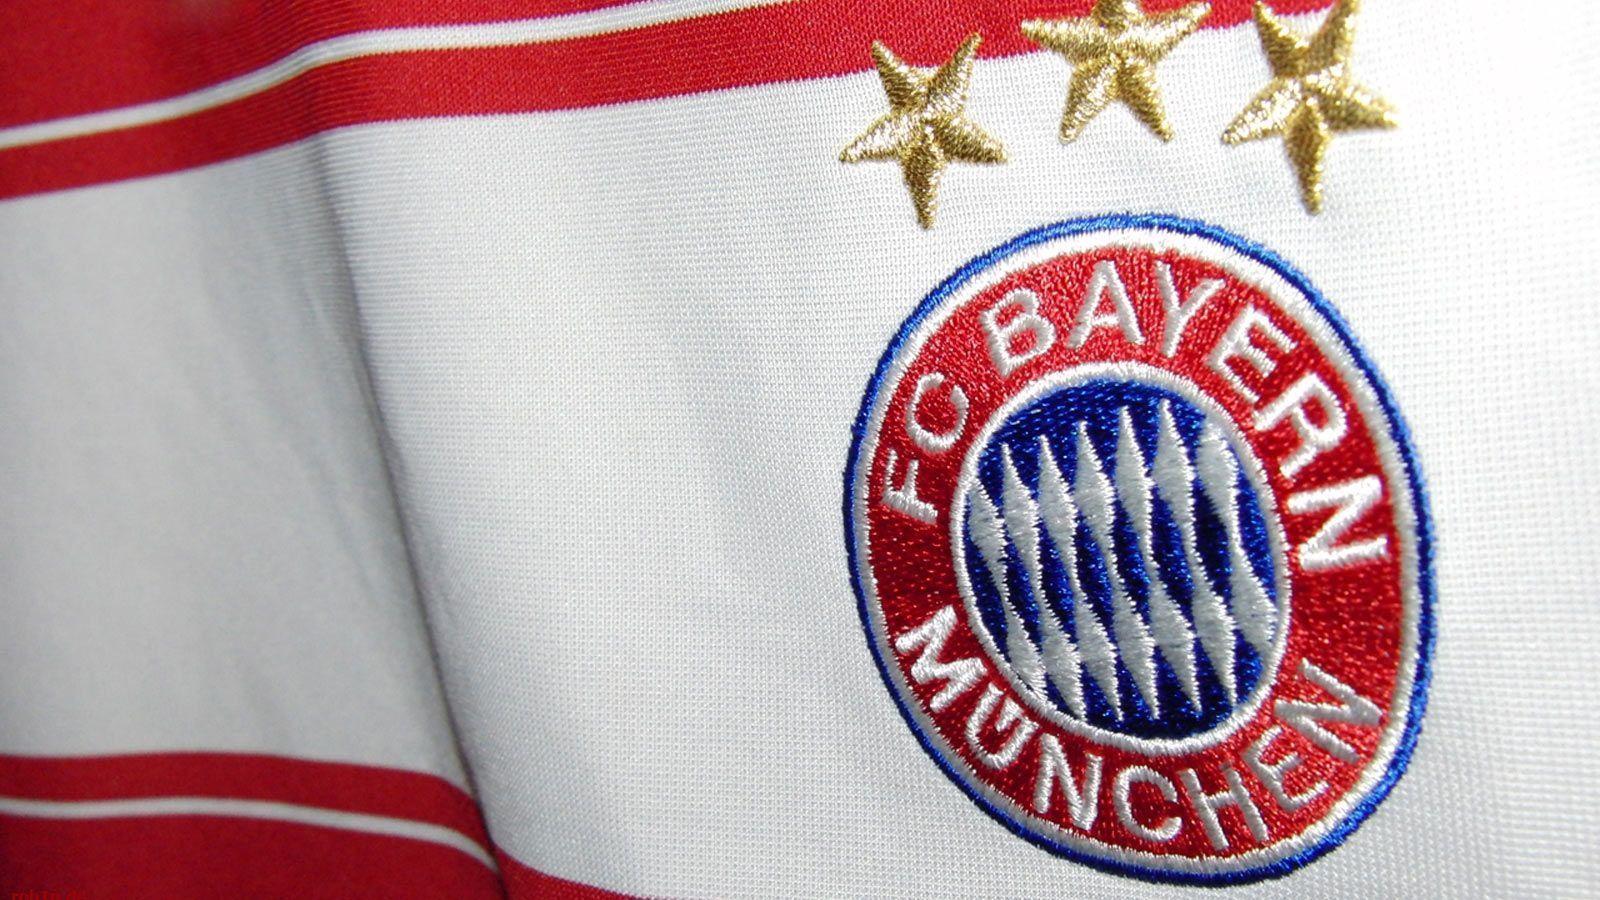 Bayern Munich Wallpaper HD Logo #12387 Wallpaper   Cool Walldiskpaper.